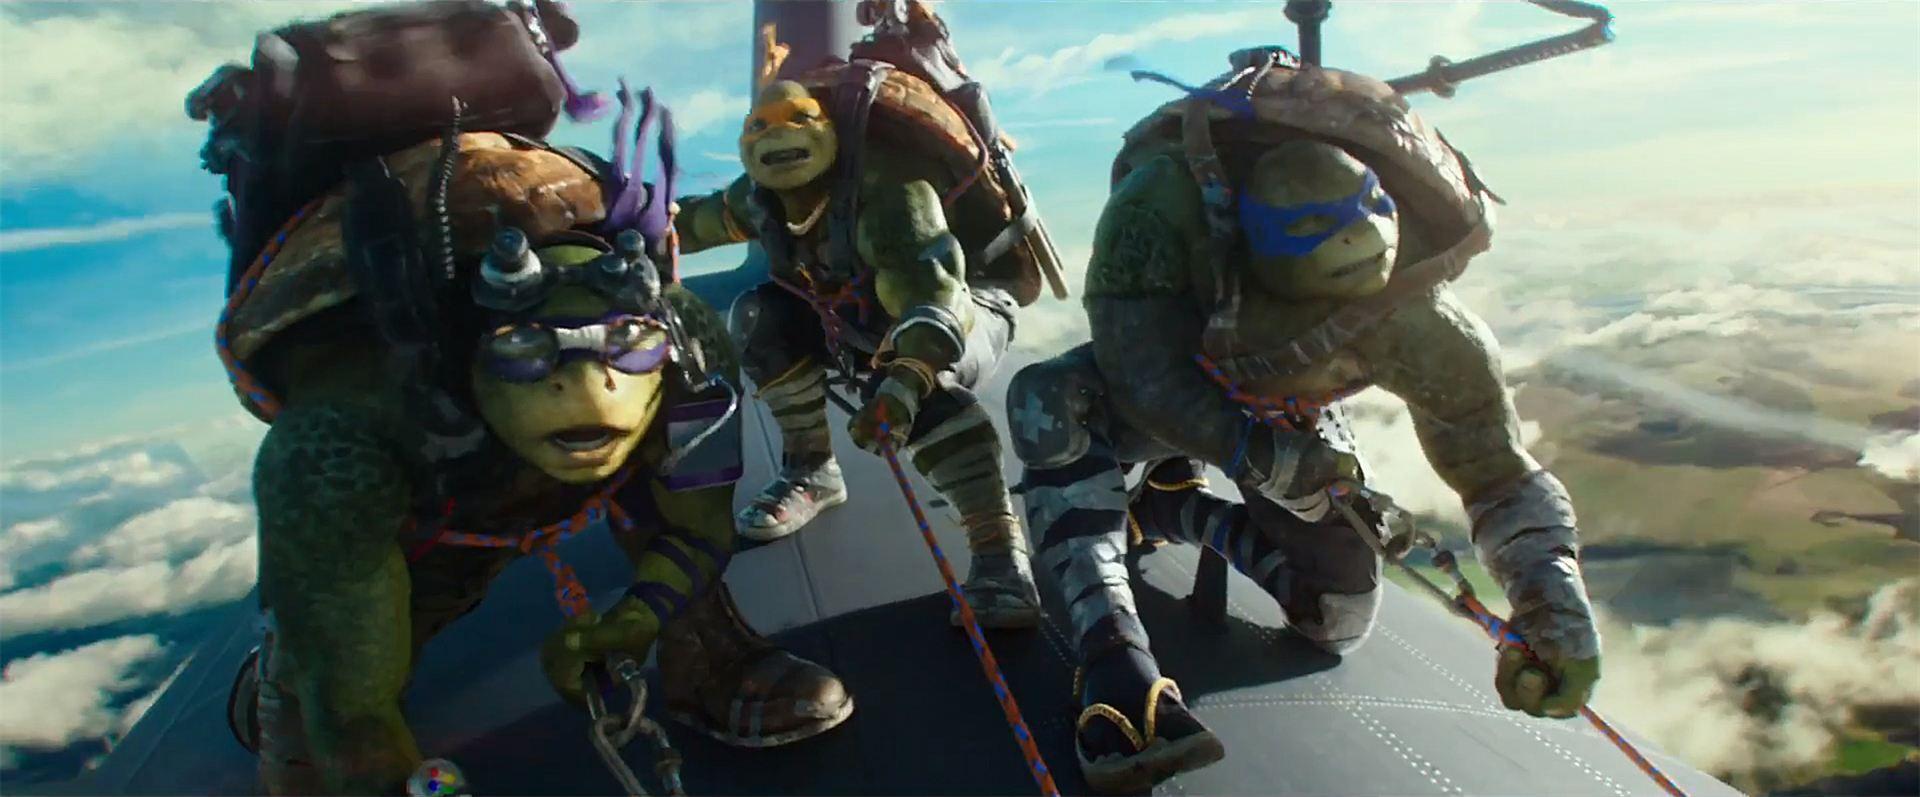 Ninja-Turtles-2-Film-Critique-1